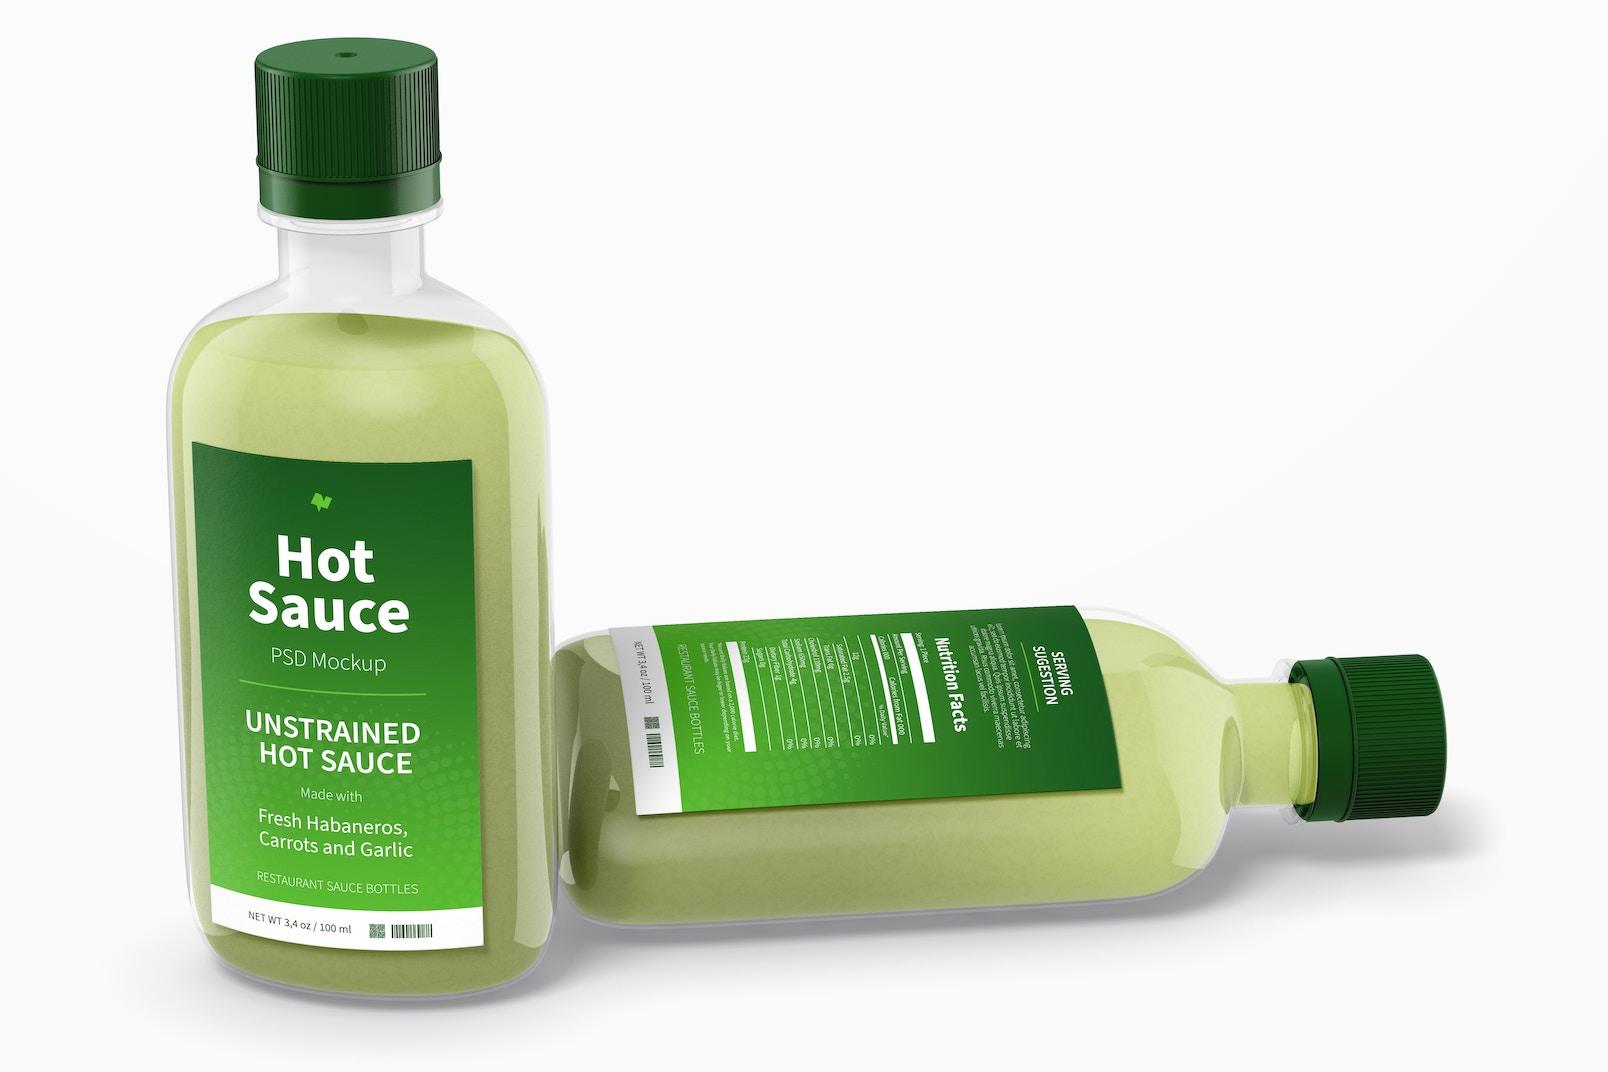 100 ml Hot Sauce Bottles Mockup, Dropped